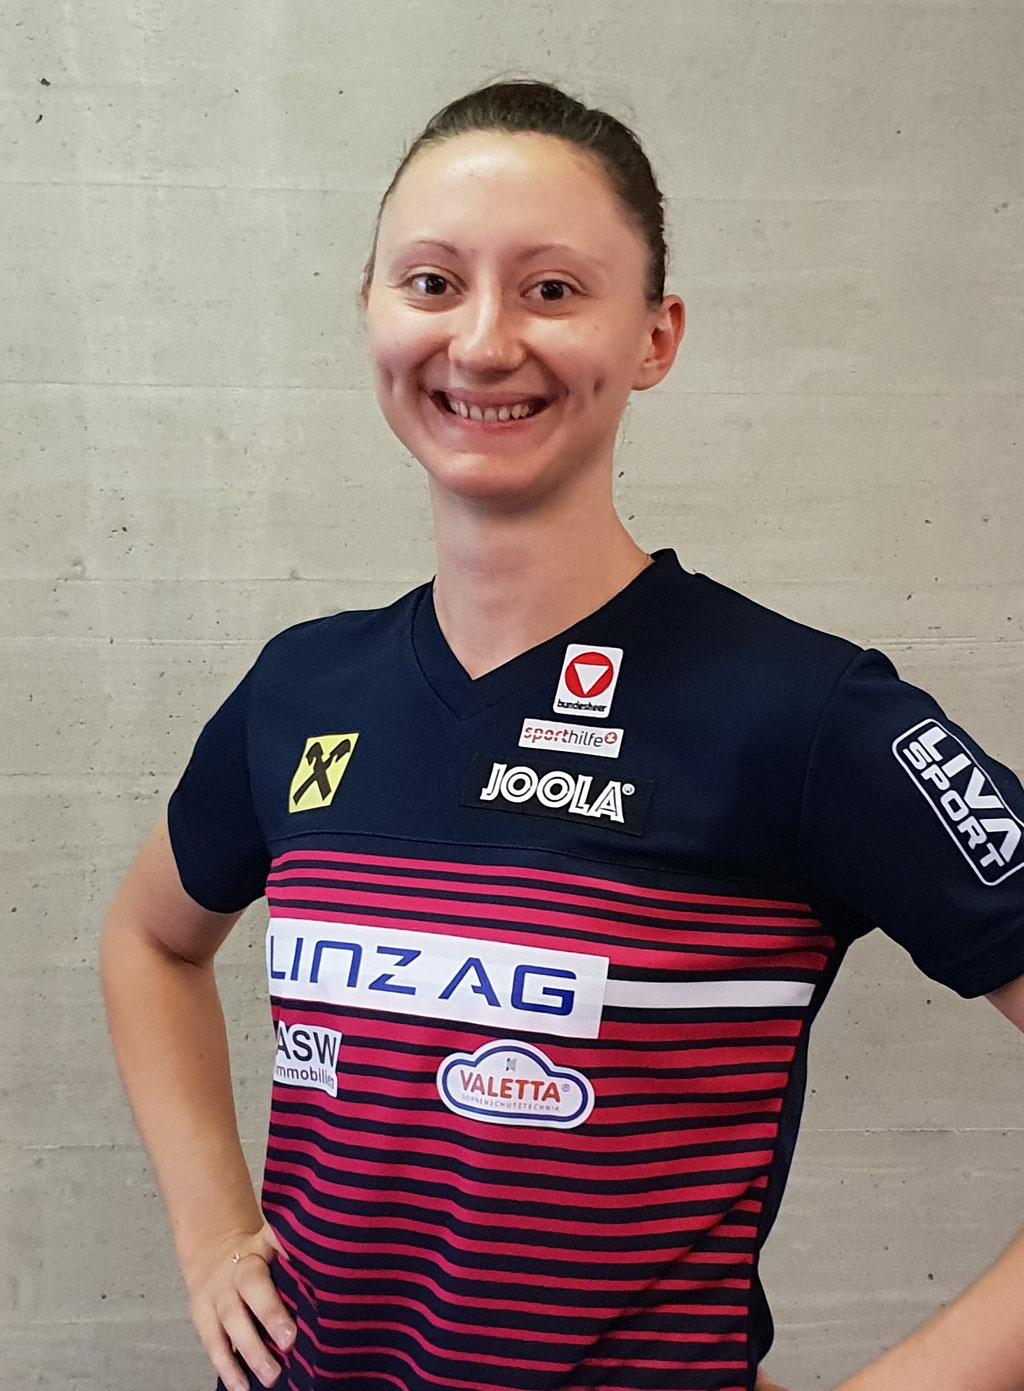 Sofia Polcanova WR 17 - Bericht vom 09.09.2018